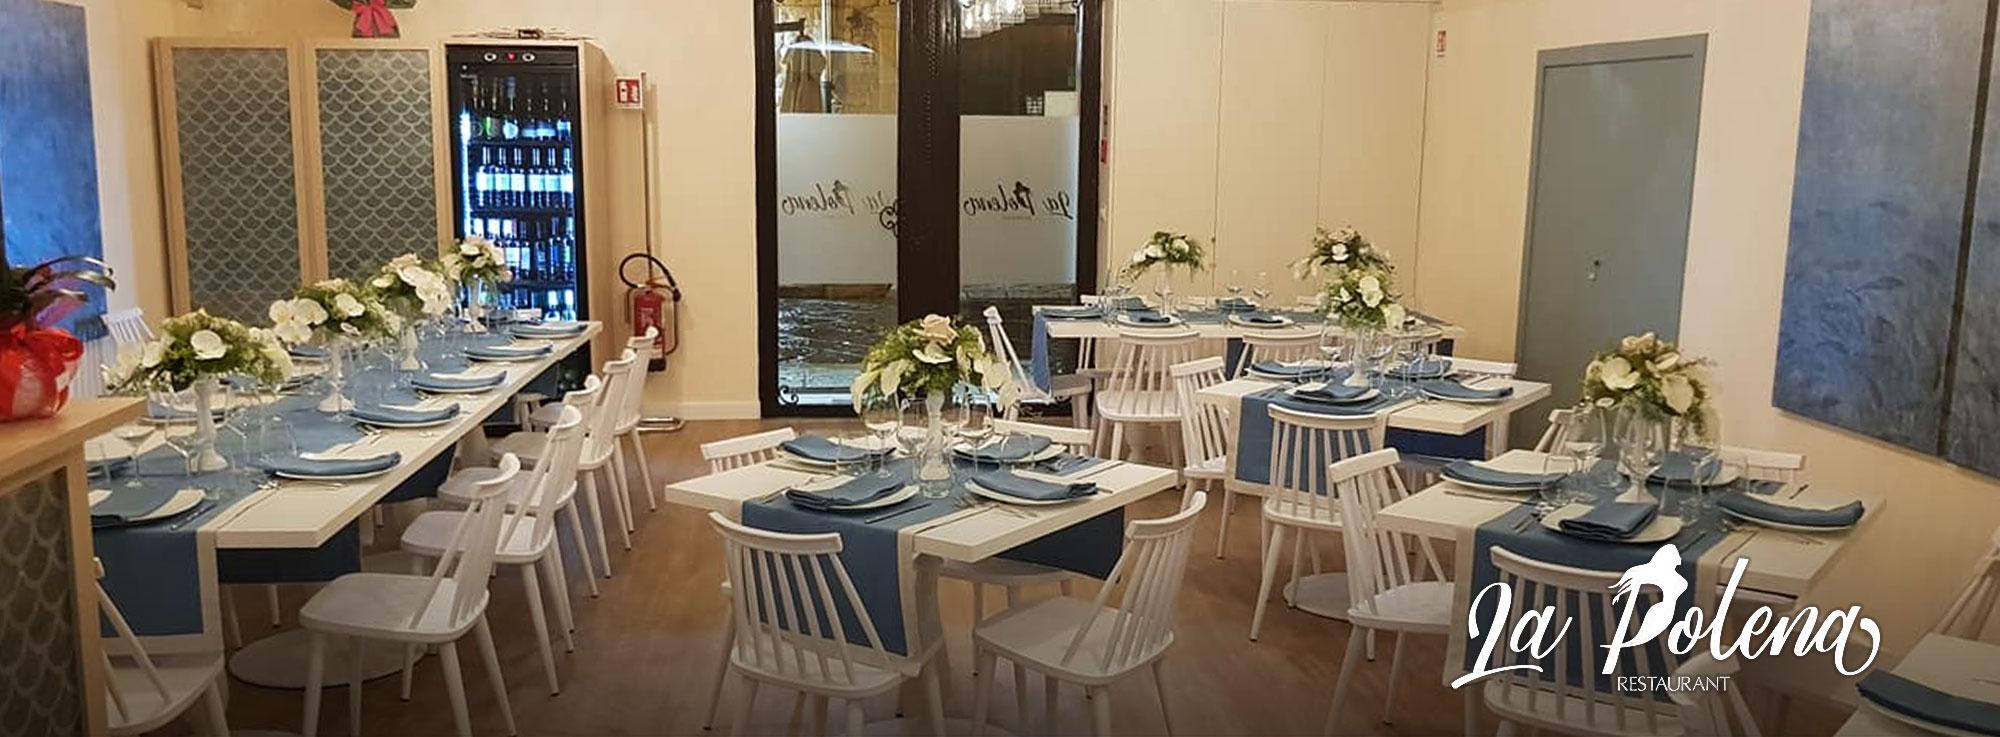 La Polena Restaurant Barletta